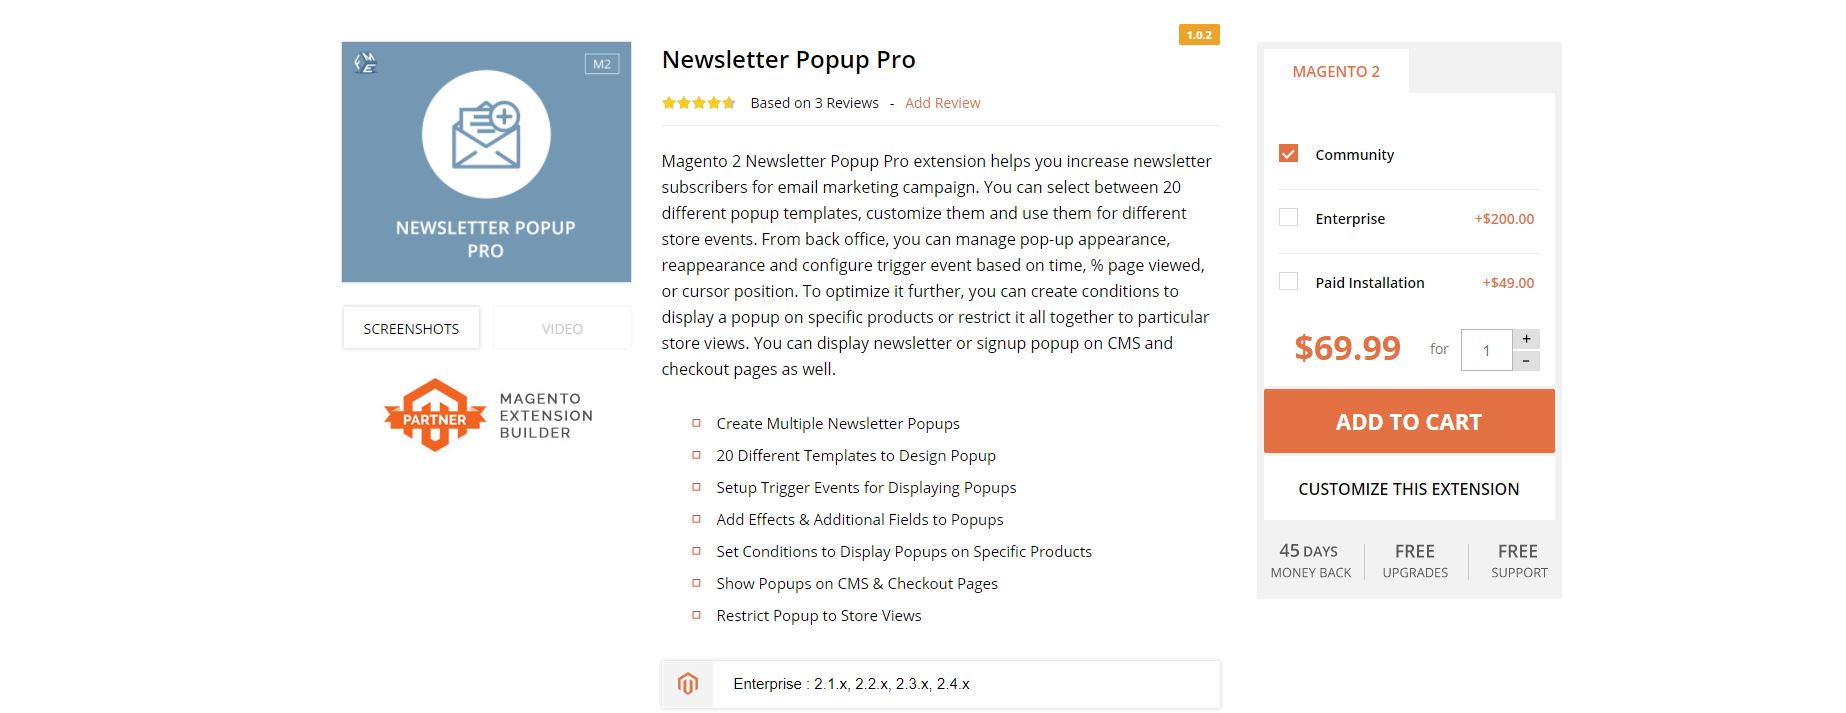 Magento newsletter extension